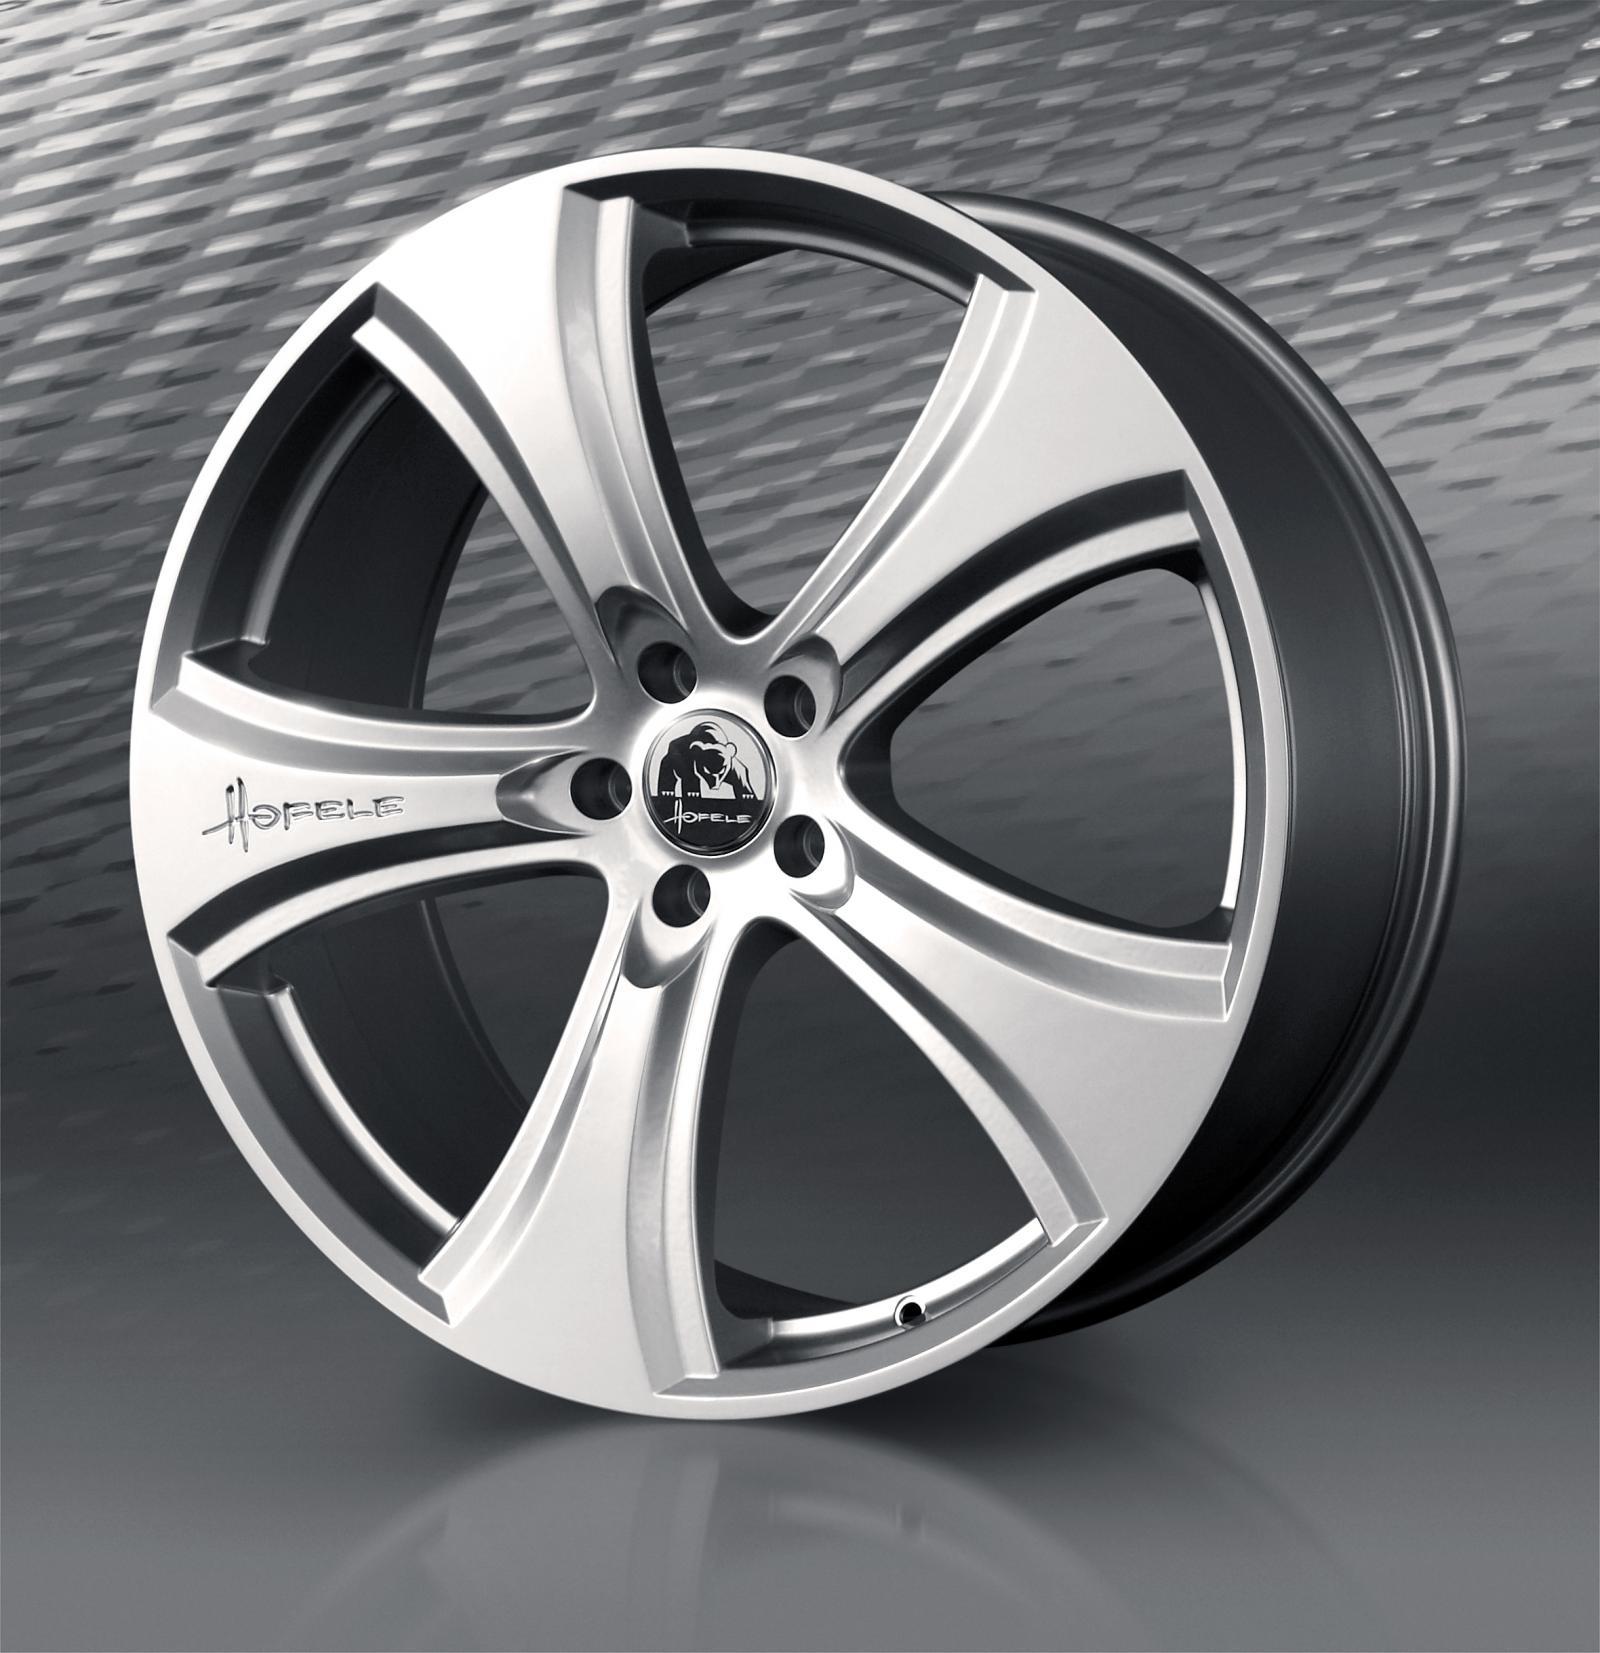 Фотогалерея тюнинга Audi Q7 от Hofele Design